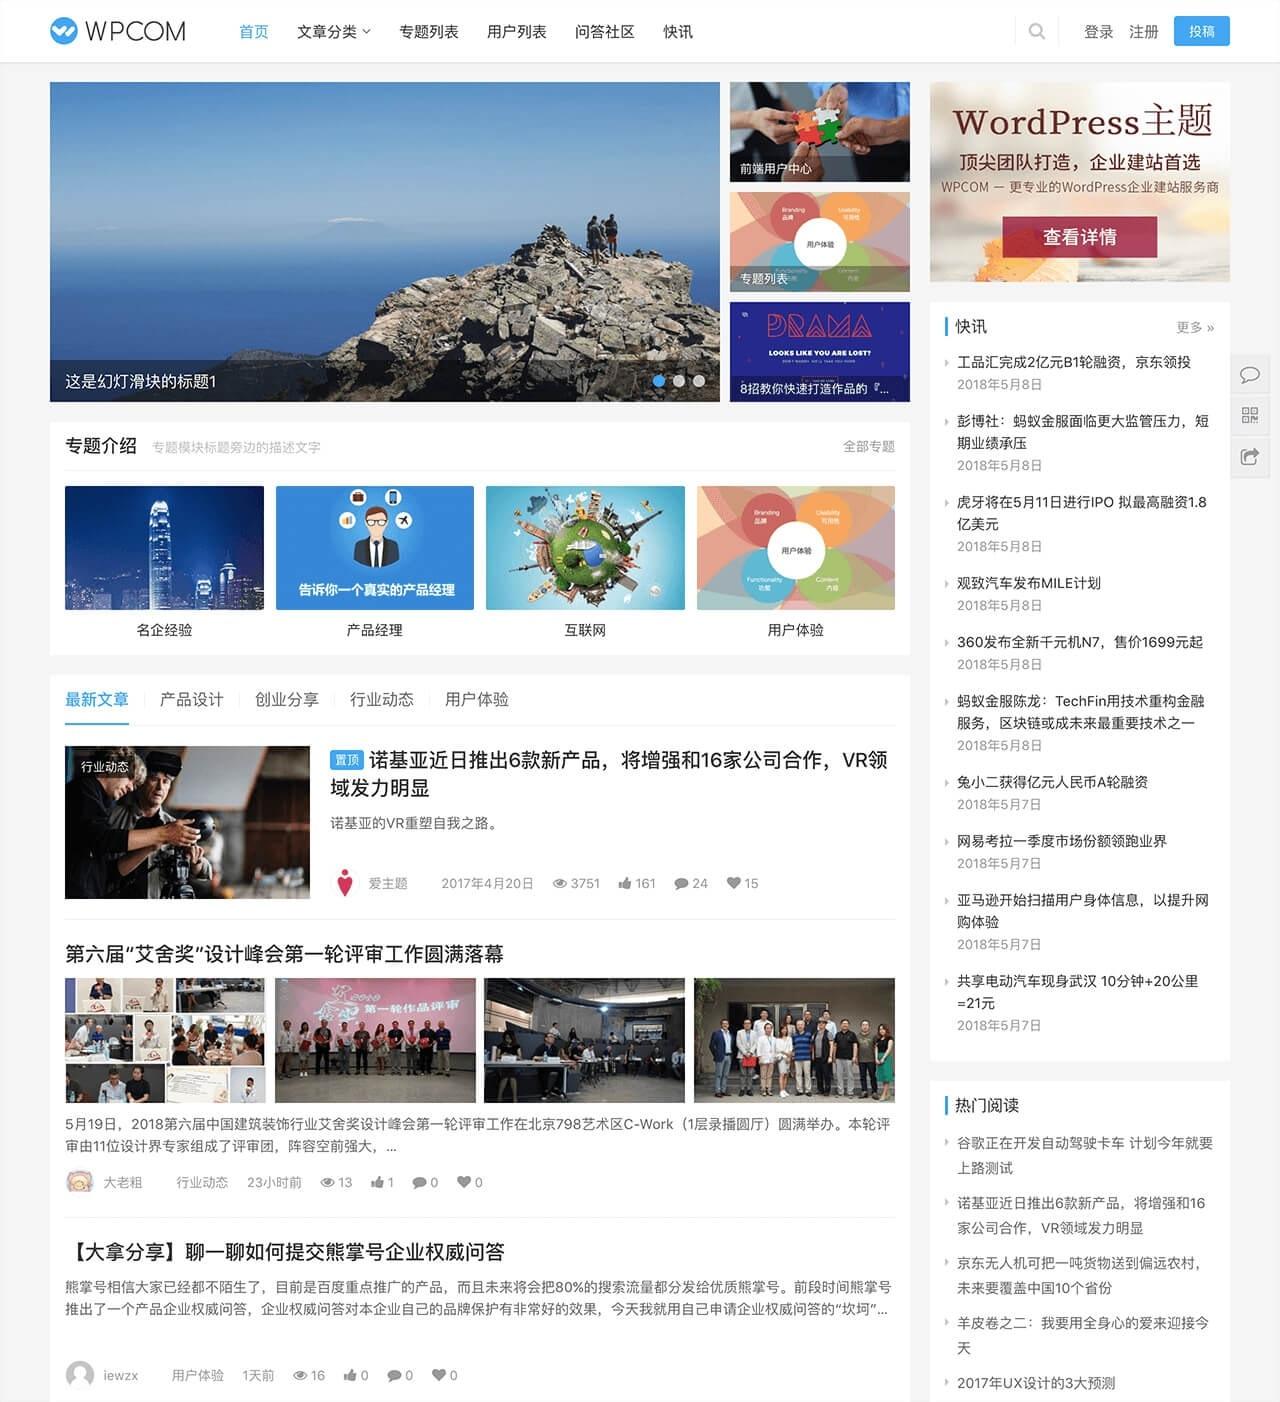 Wordpress的justnews主题破解去授权无限制版本V4.3.0(更新V5.7.3)